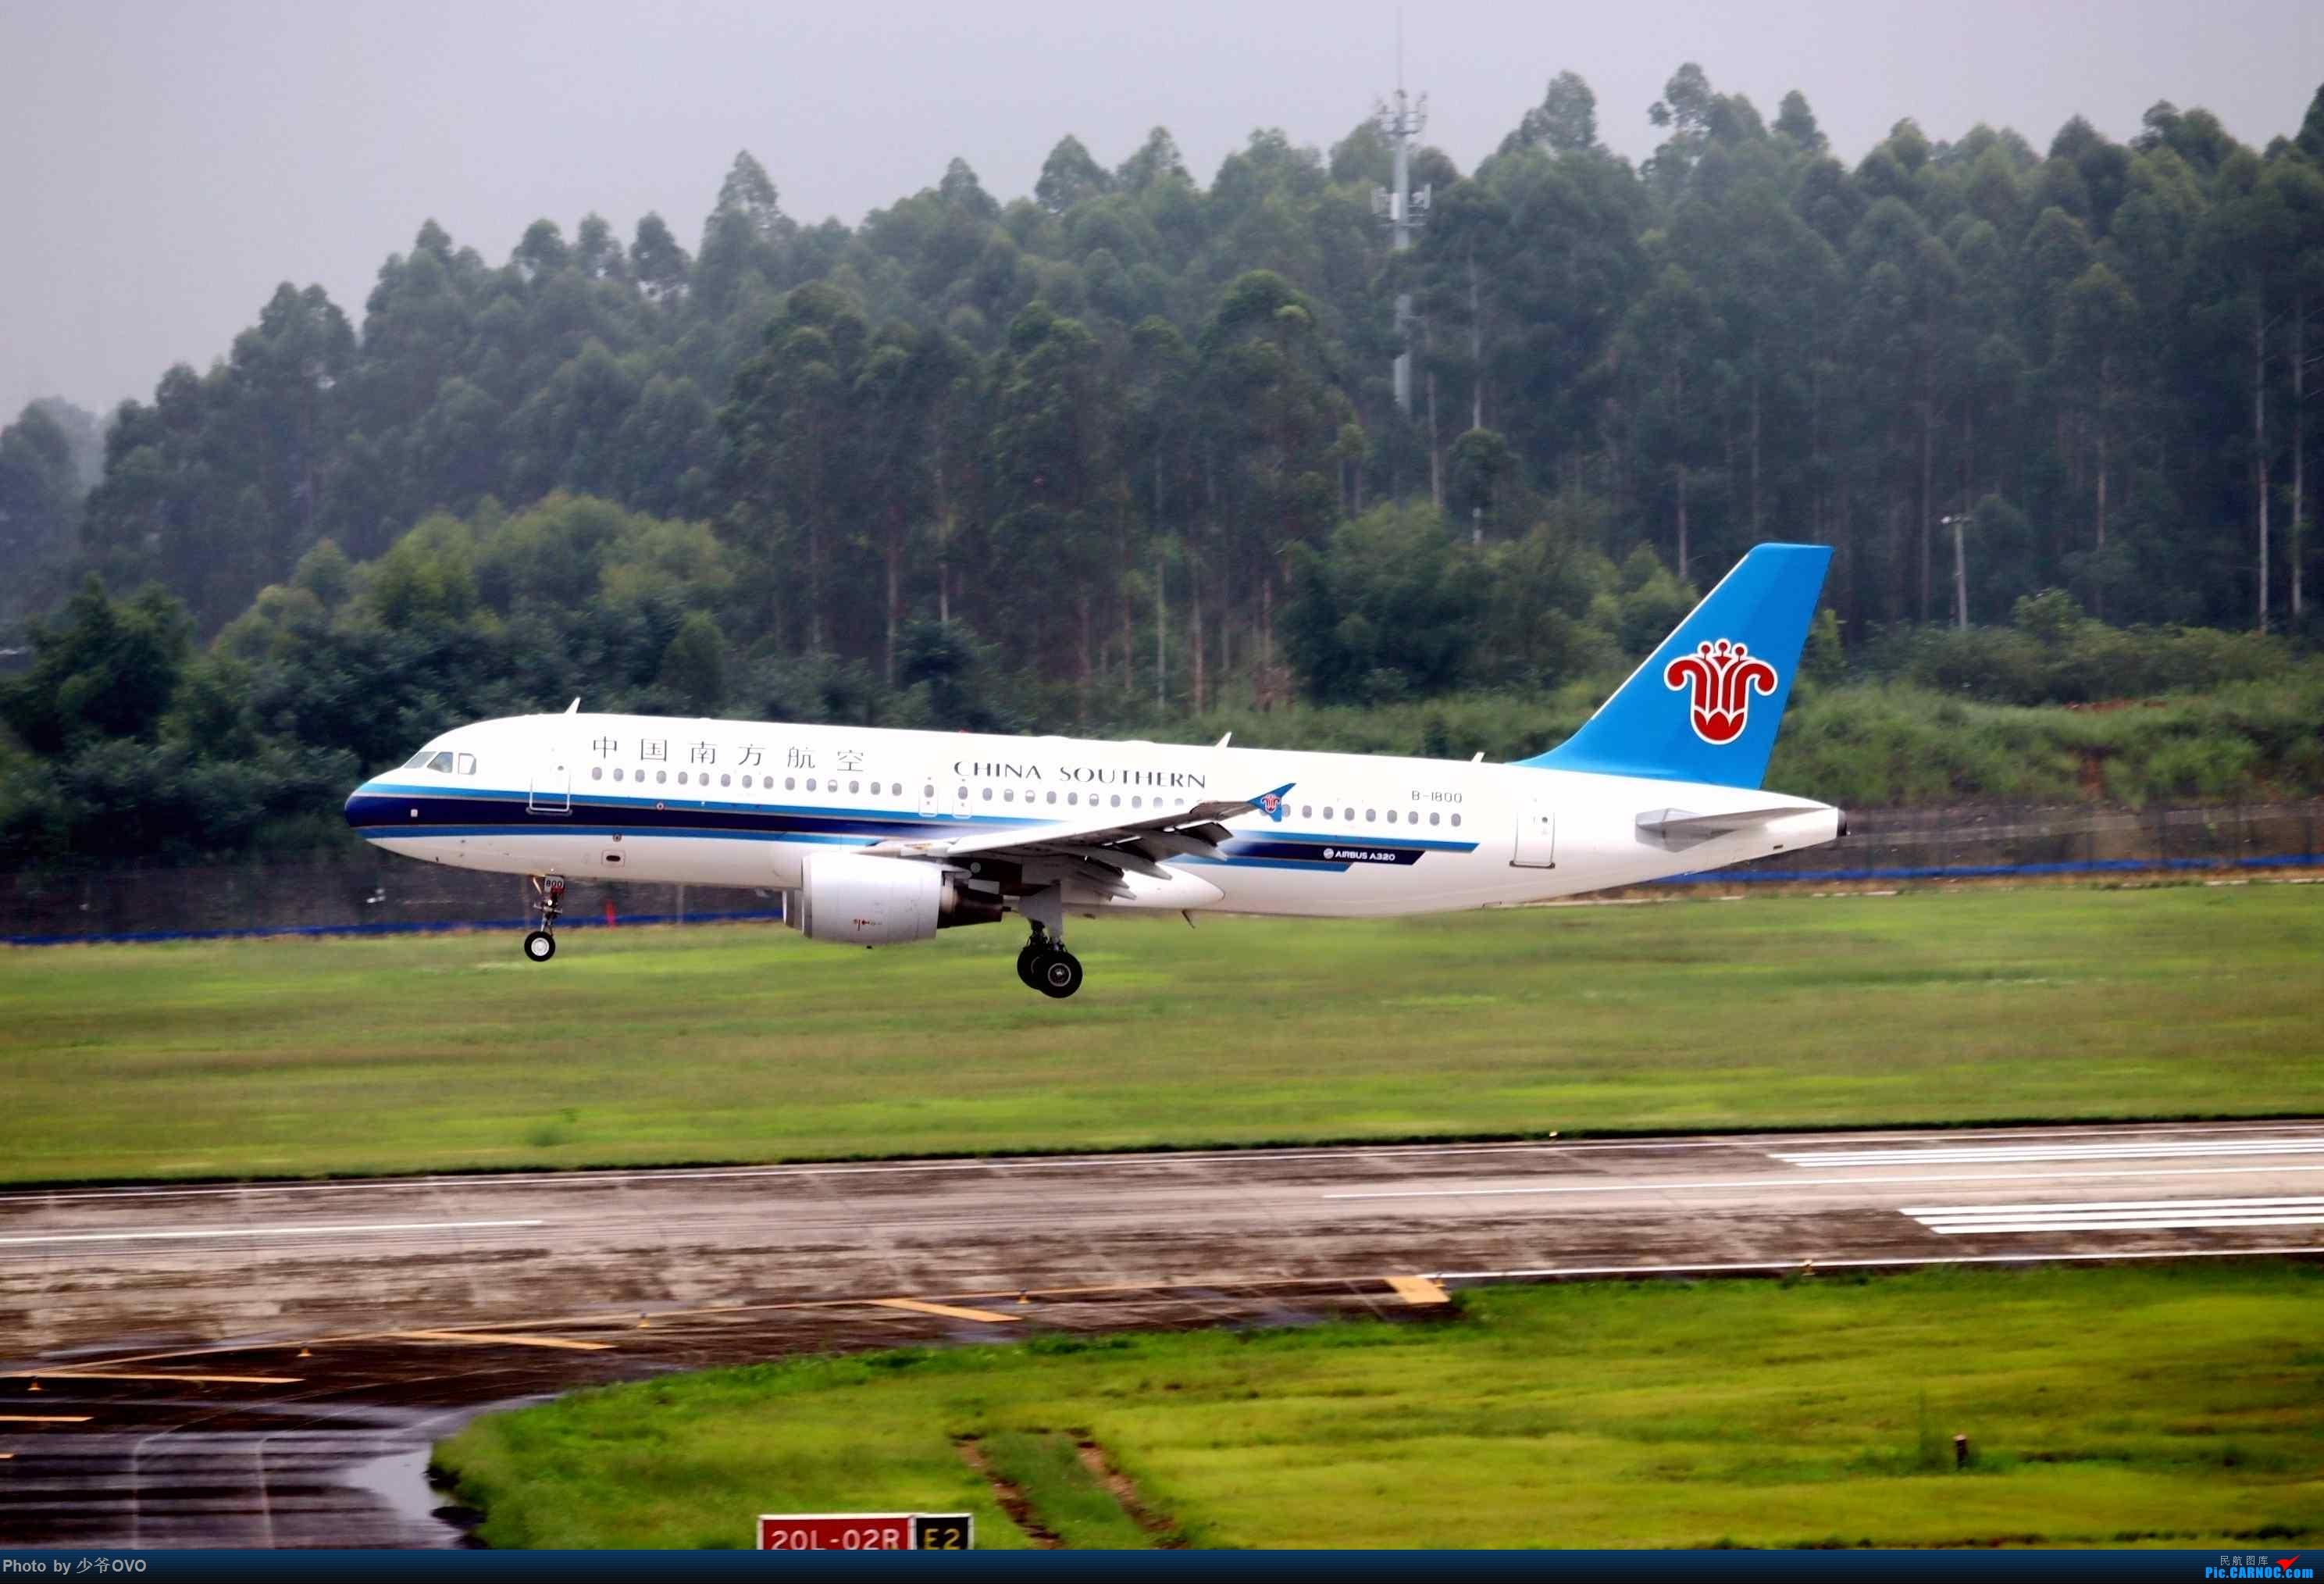 Re:[原创](2020.8.1)少爷的CTU拍机(厦门航空联合国787) AIRBUS A320-200 B-1800 中国成都双流国际机场